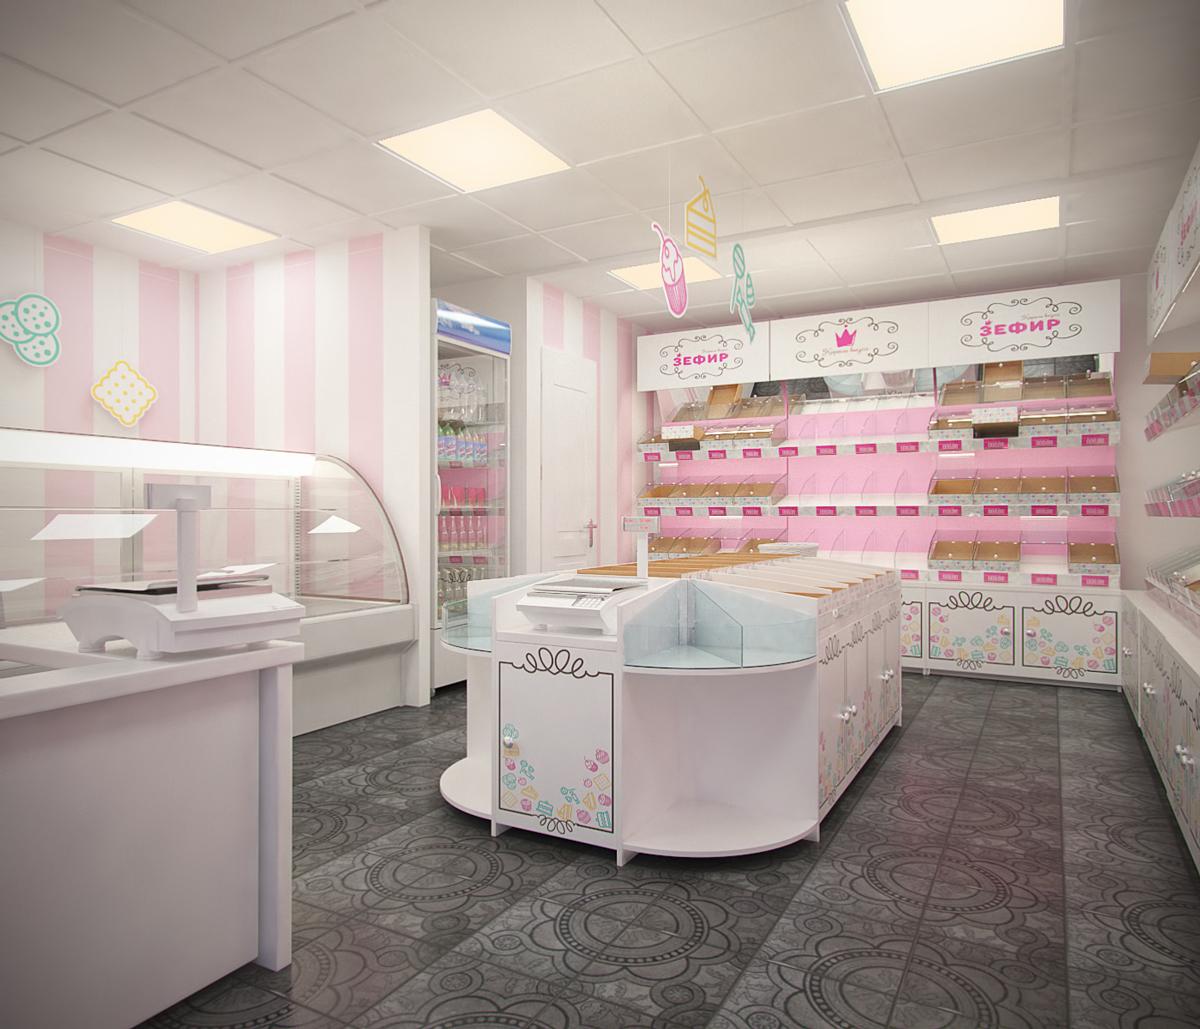 08c7b4f7f082 Разработка дизайна магазина сладостей «Зефир»   Дизайн сайта ...